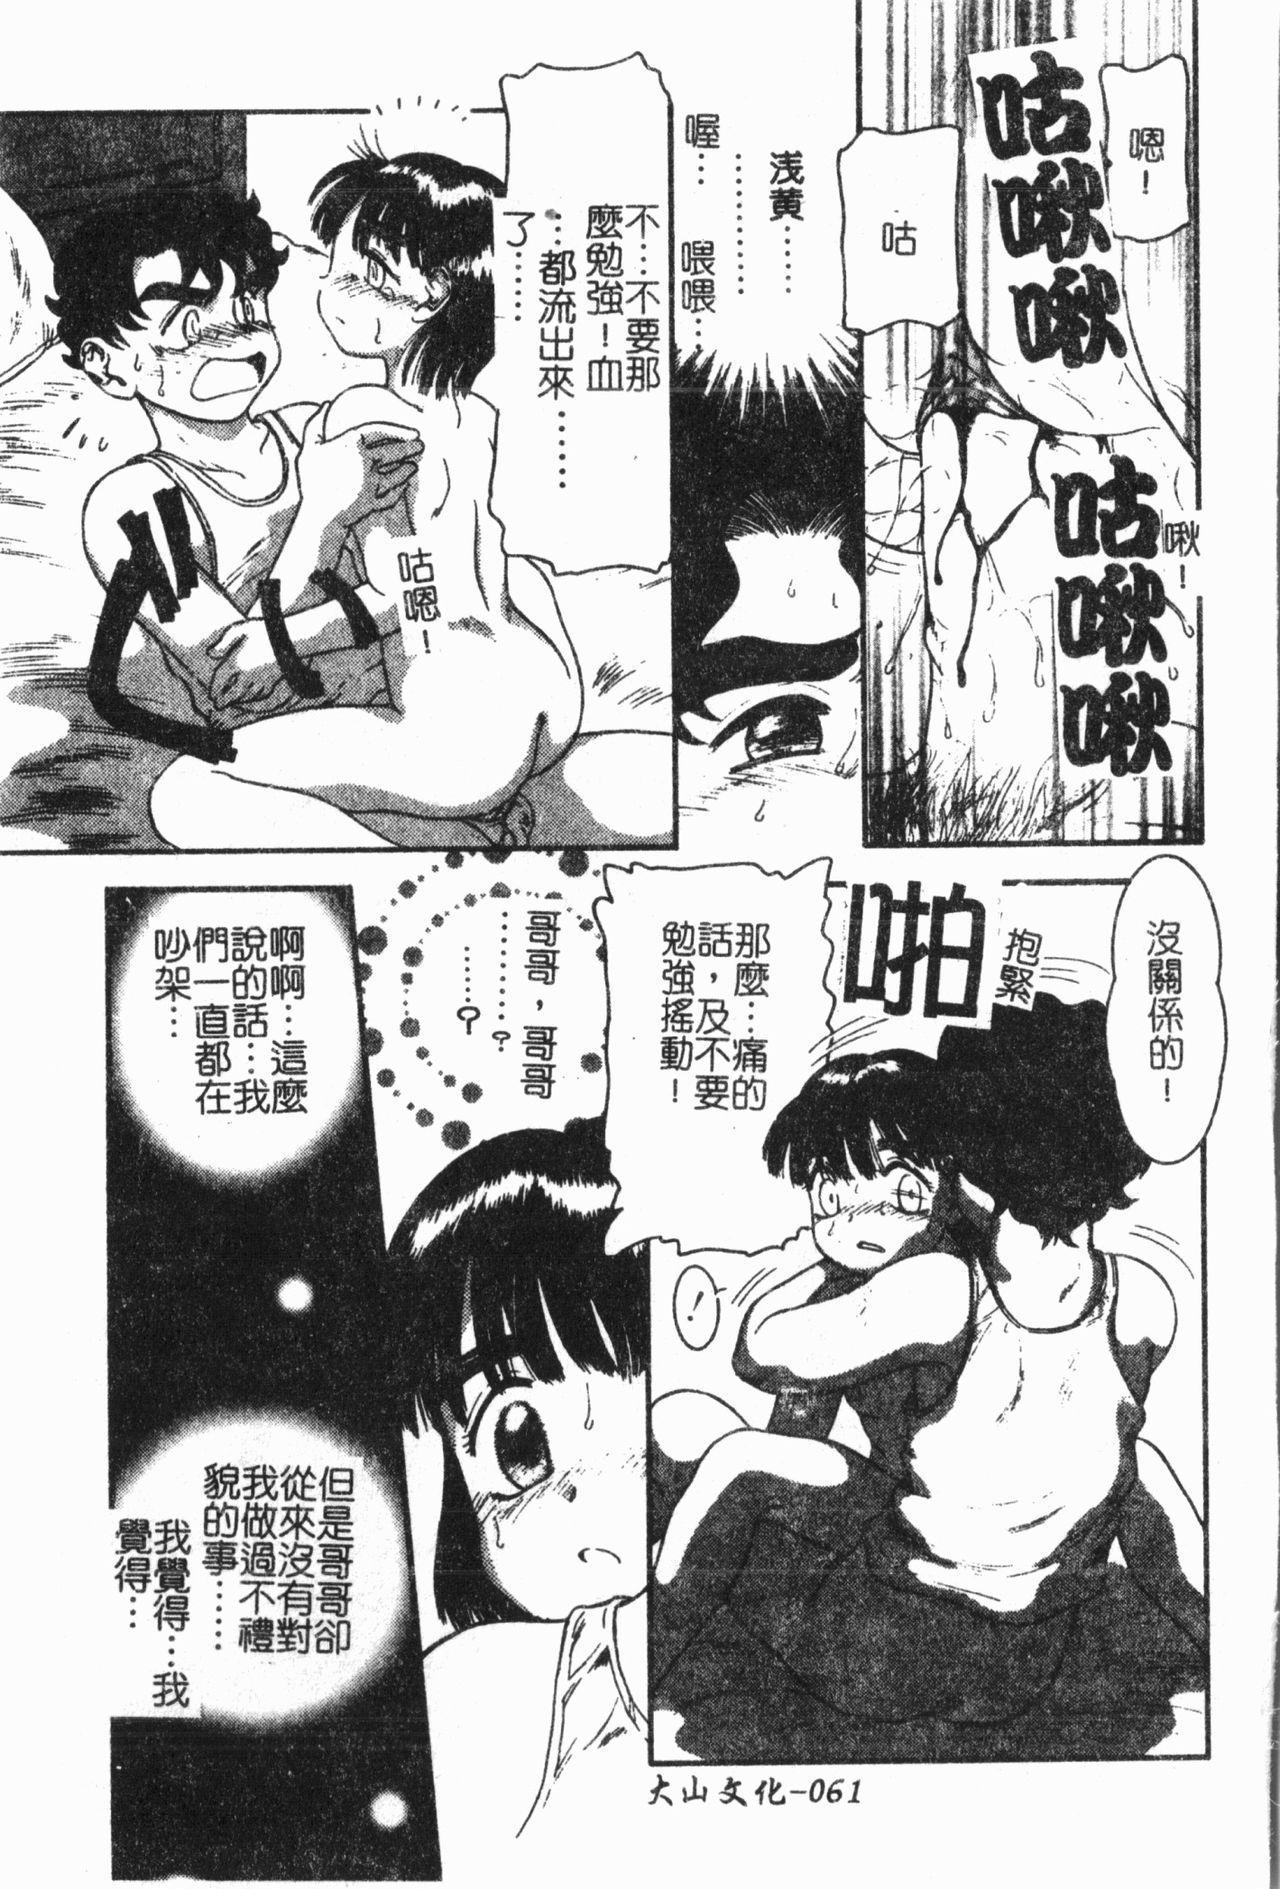 Imouto Koishi 6 63